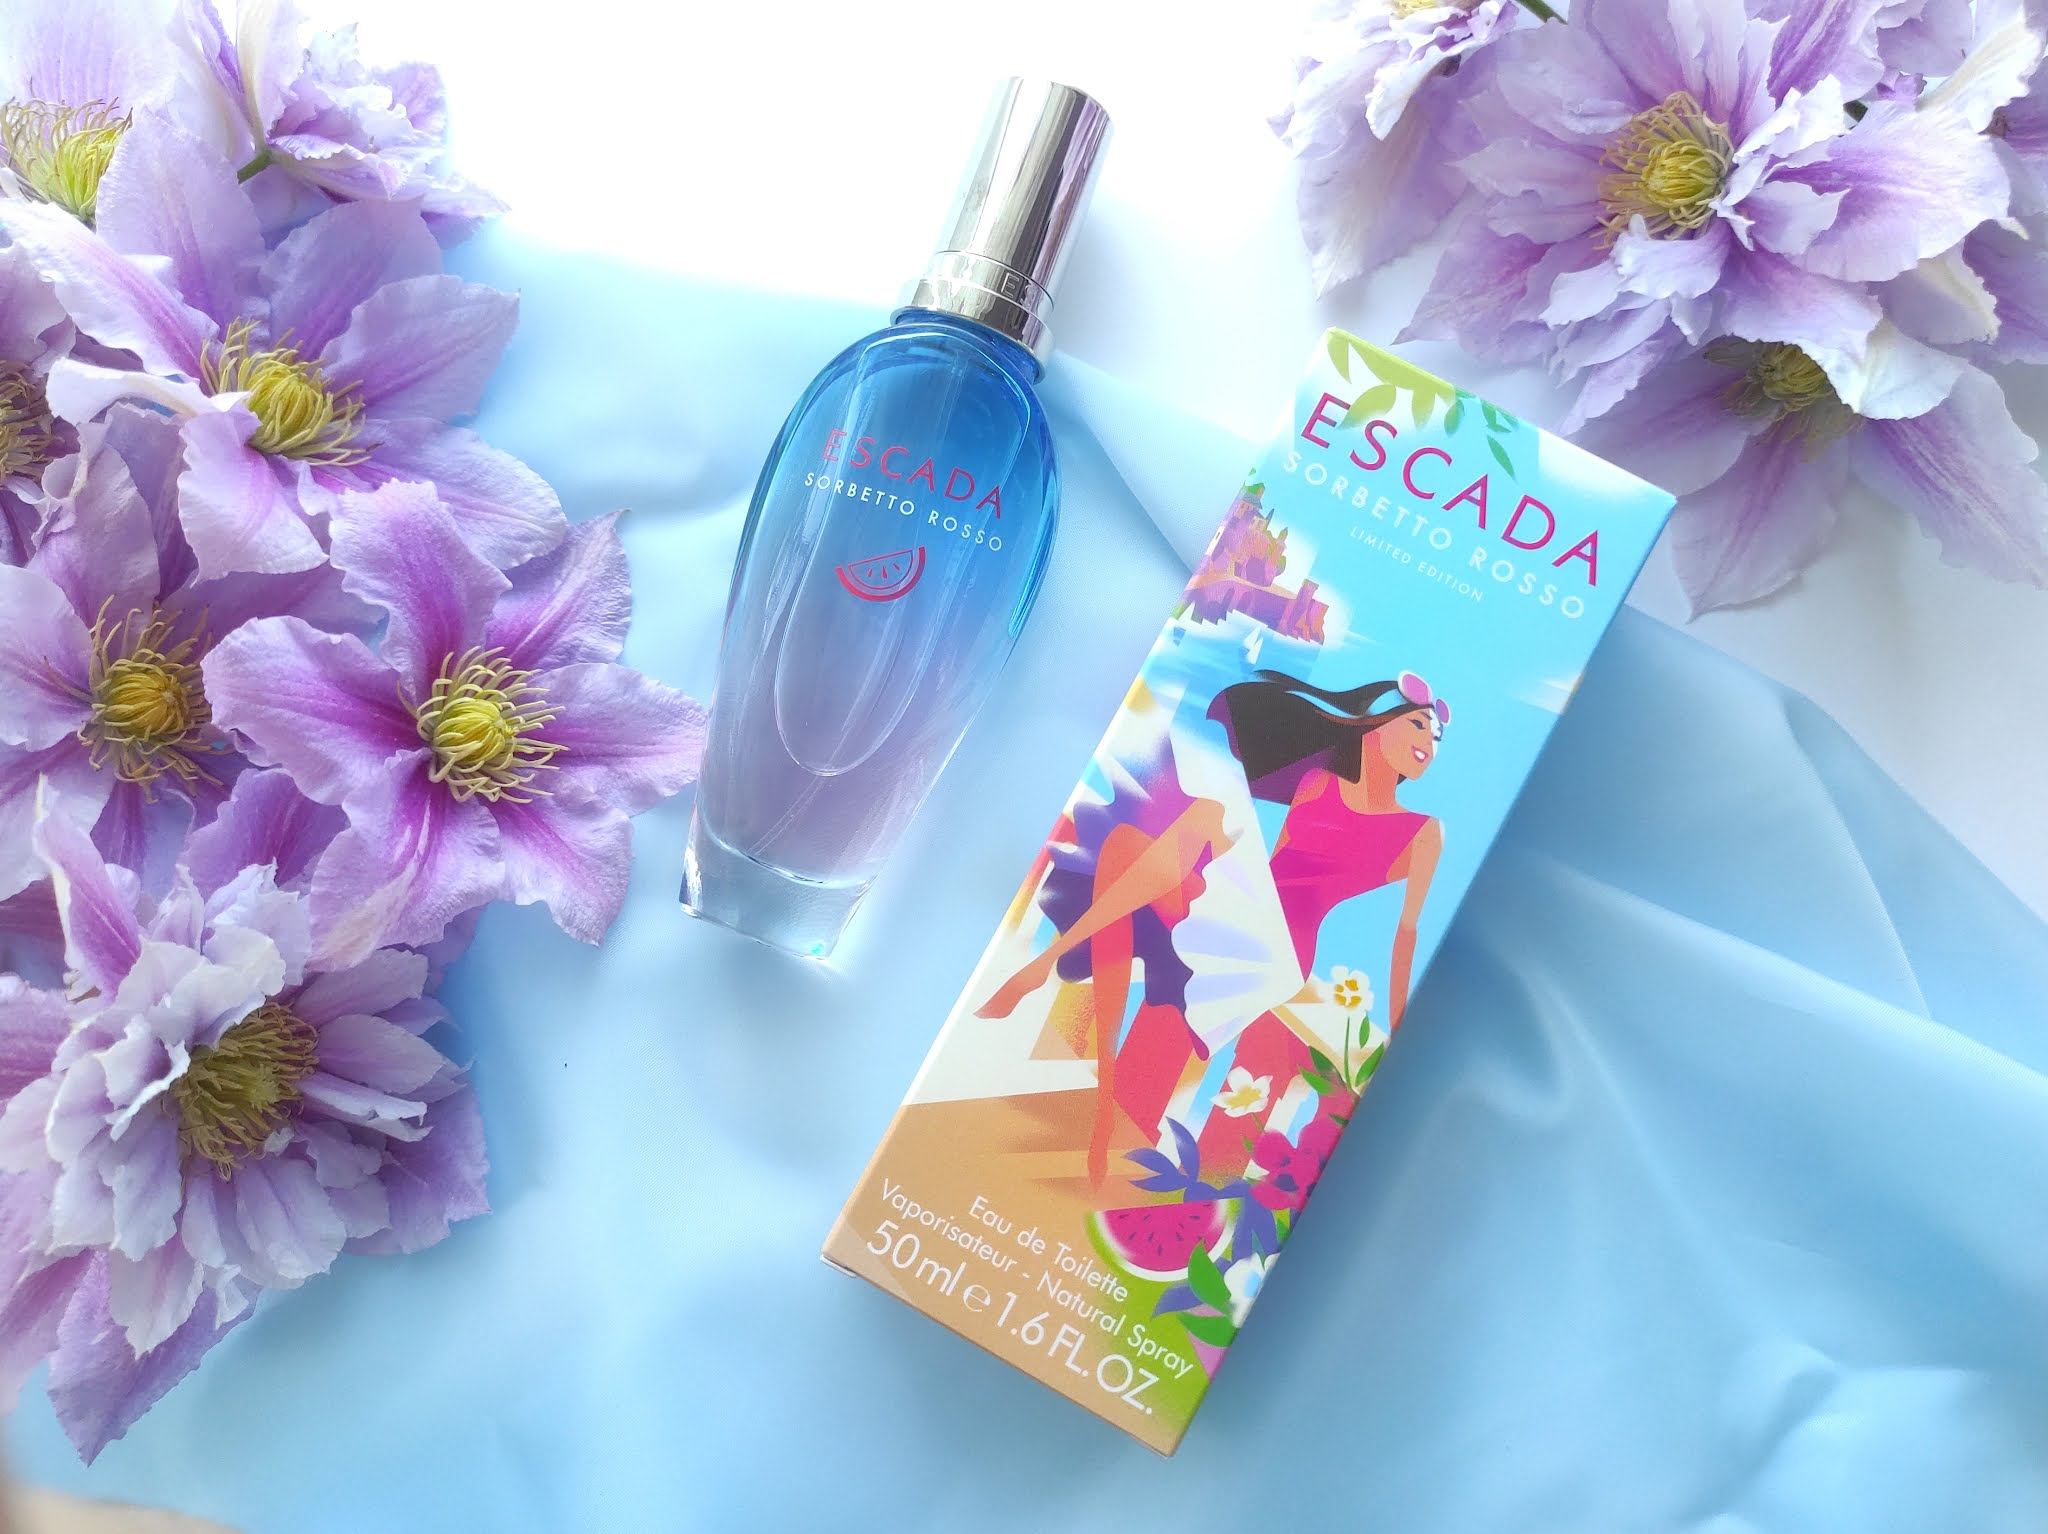 Letnie perfumy Escada Sorbetto Rosso